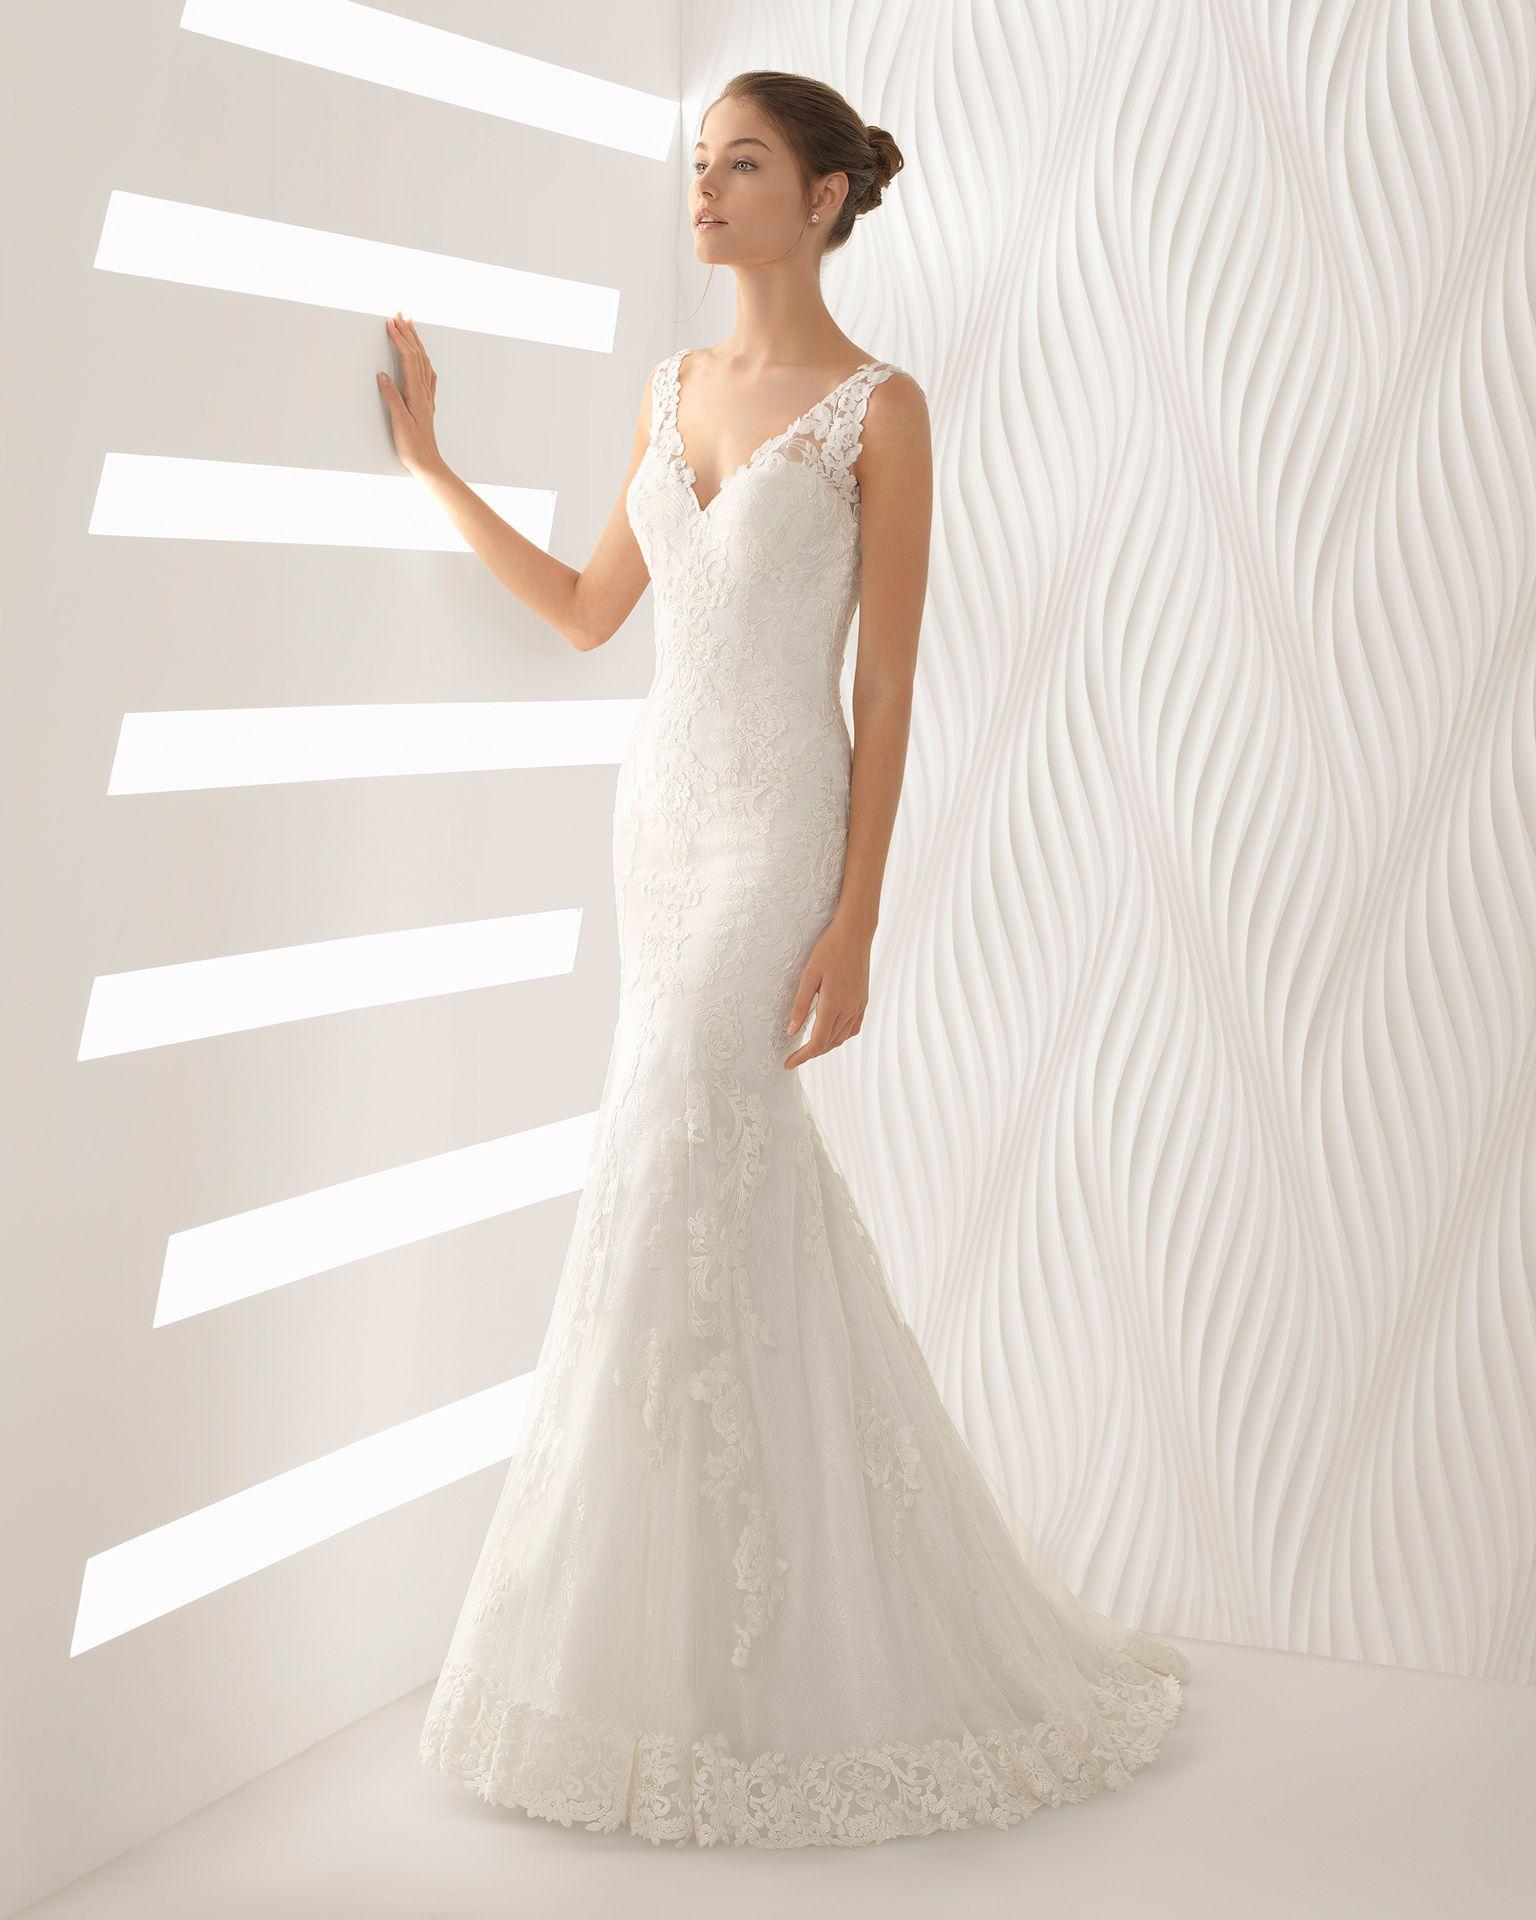 Imрісћgenes de vestidos de novia corte sirena